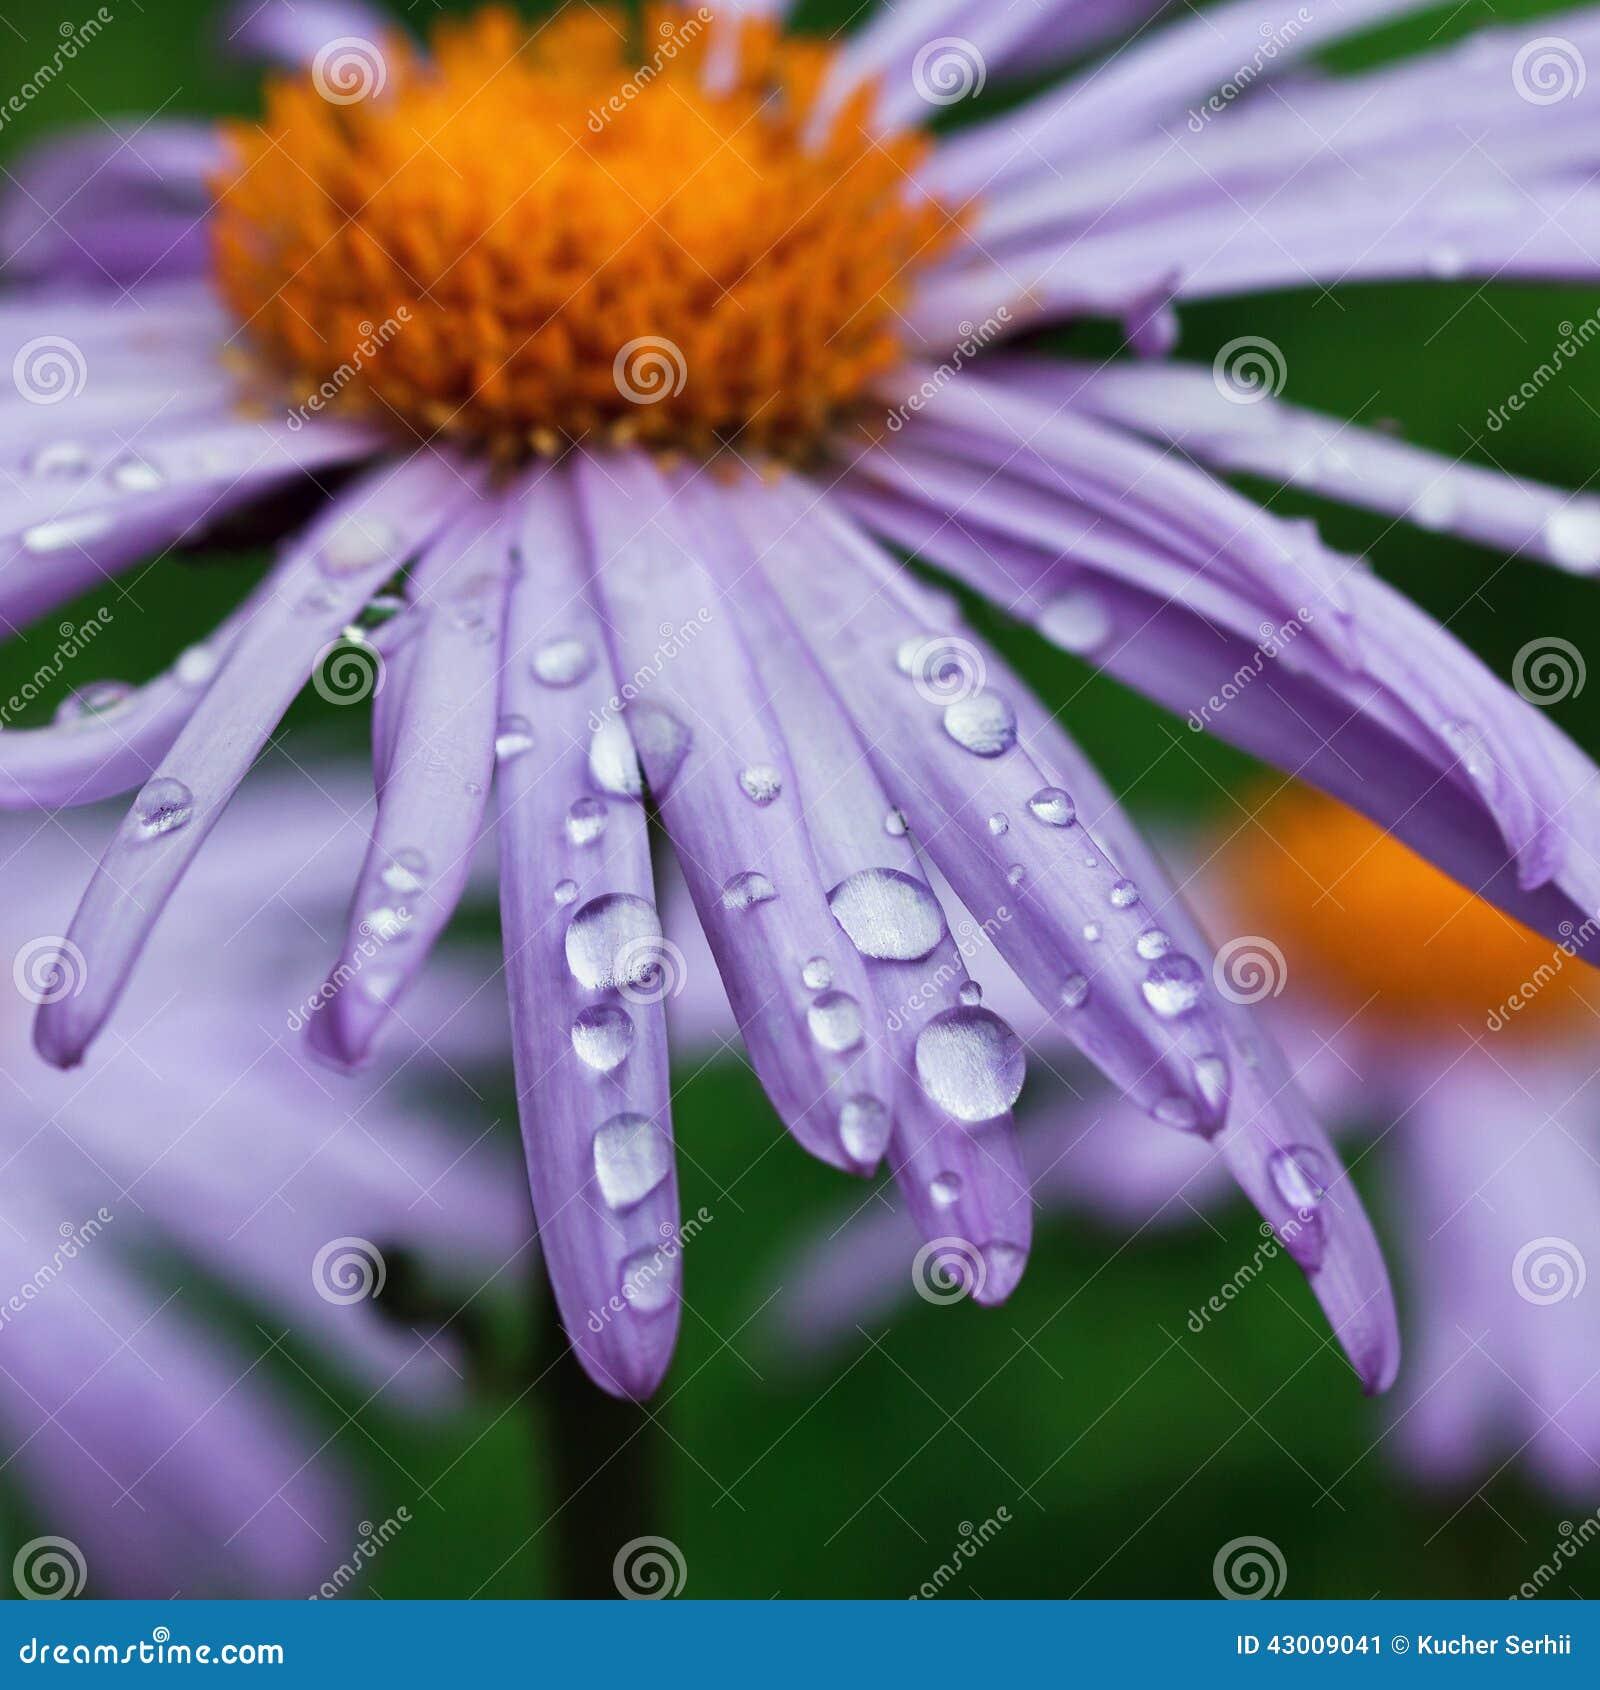 Purple Daisy Flowers With Raindrops Stock Photo 43009041 Megapixl